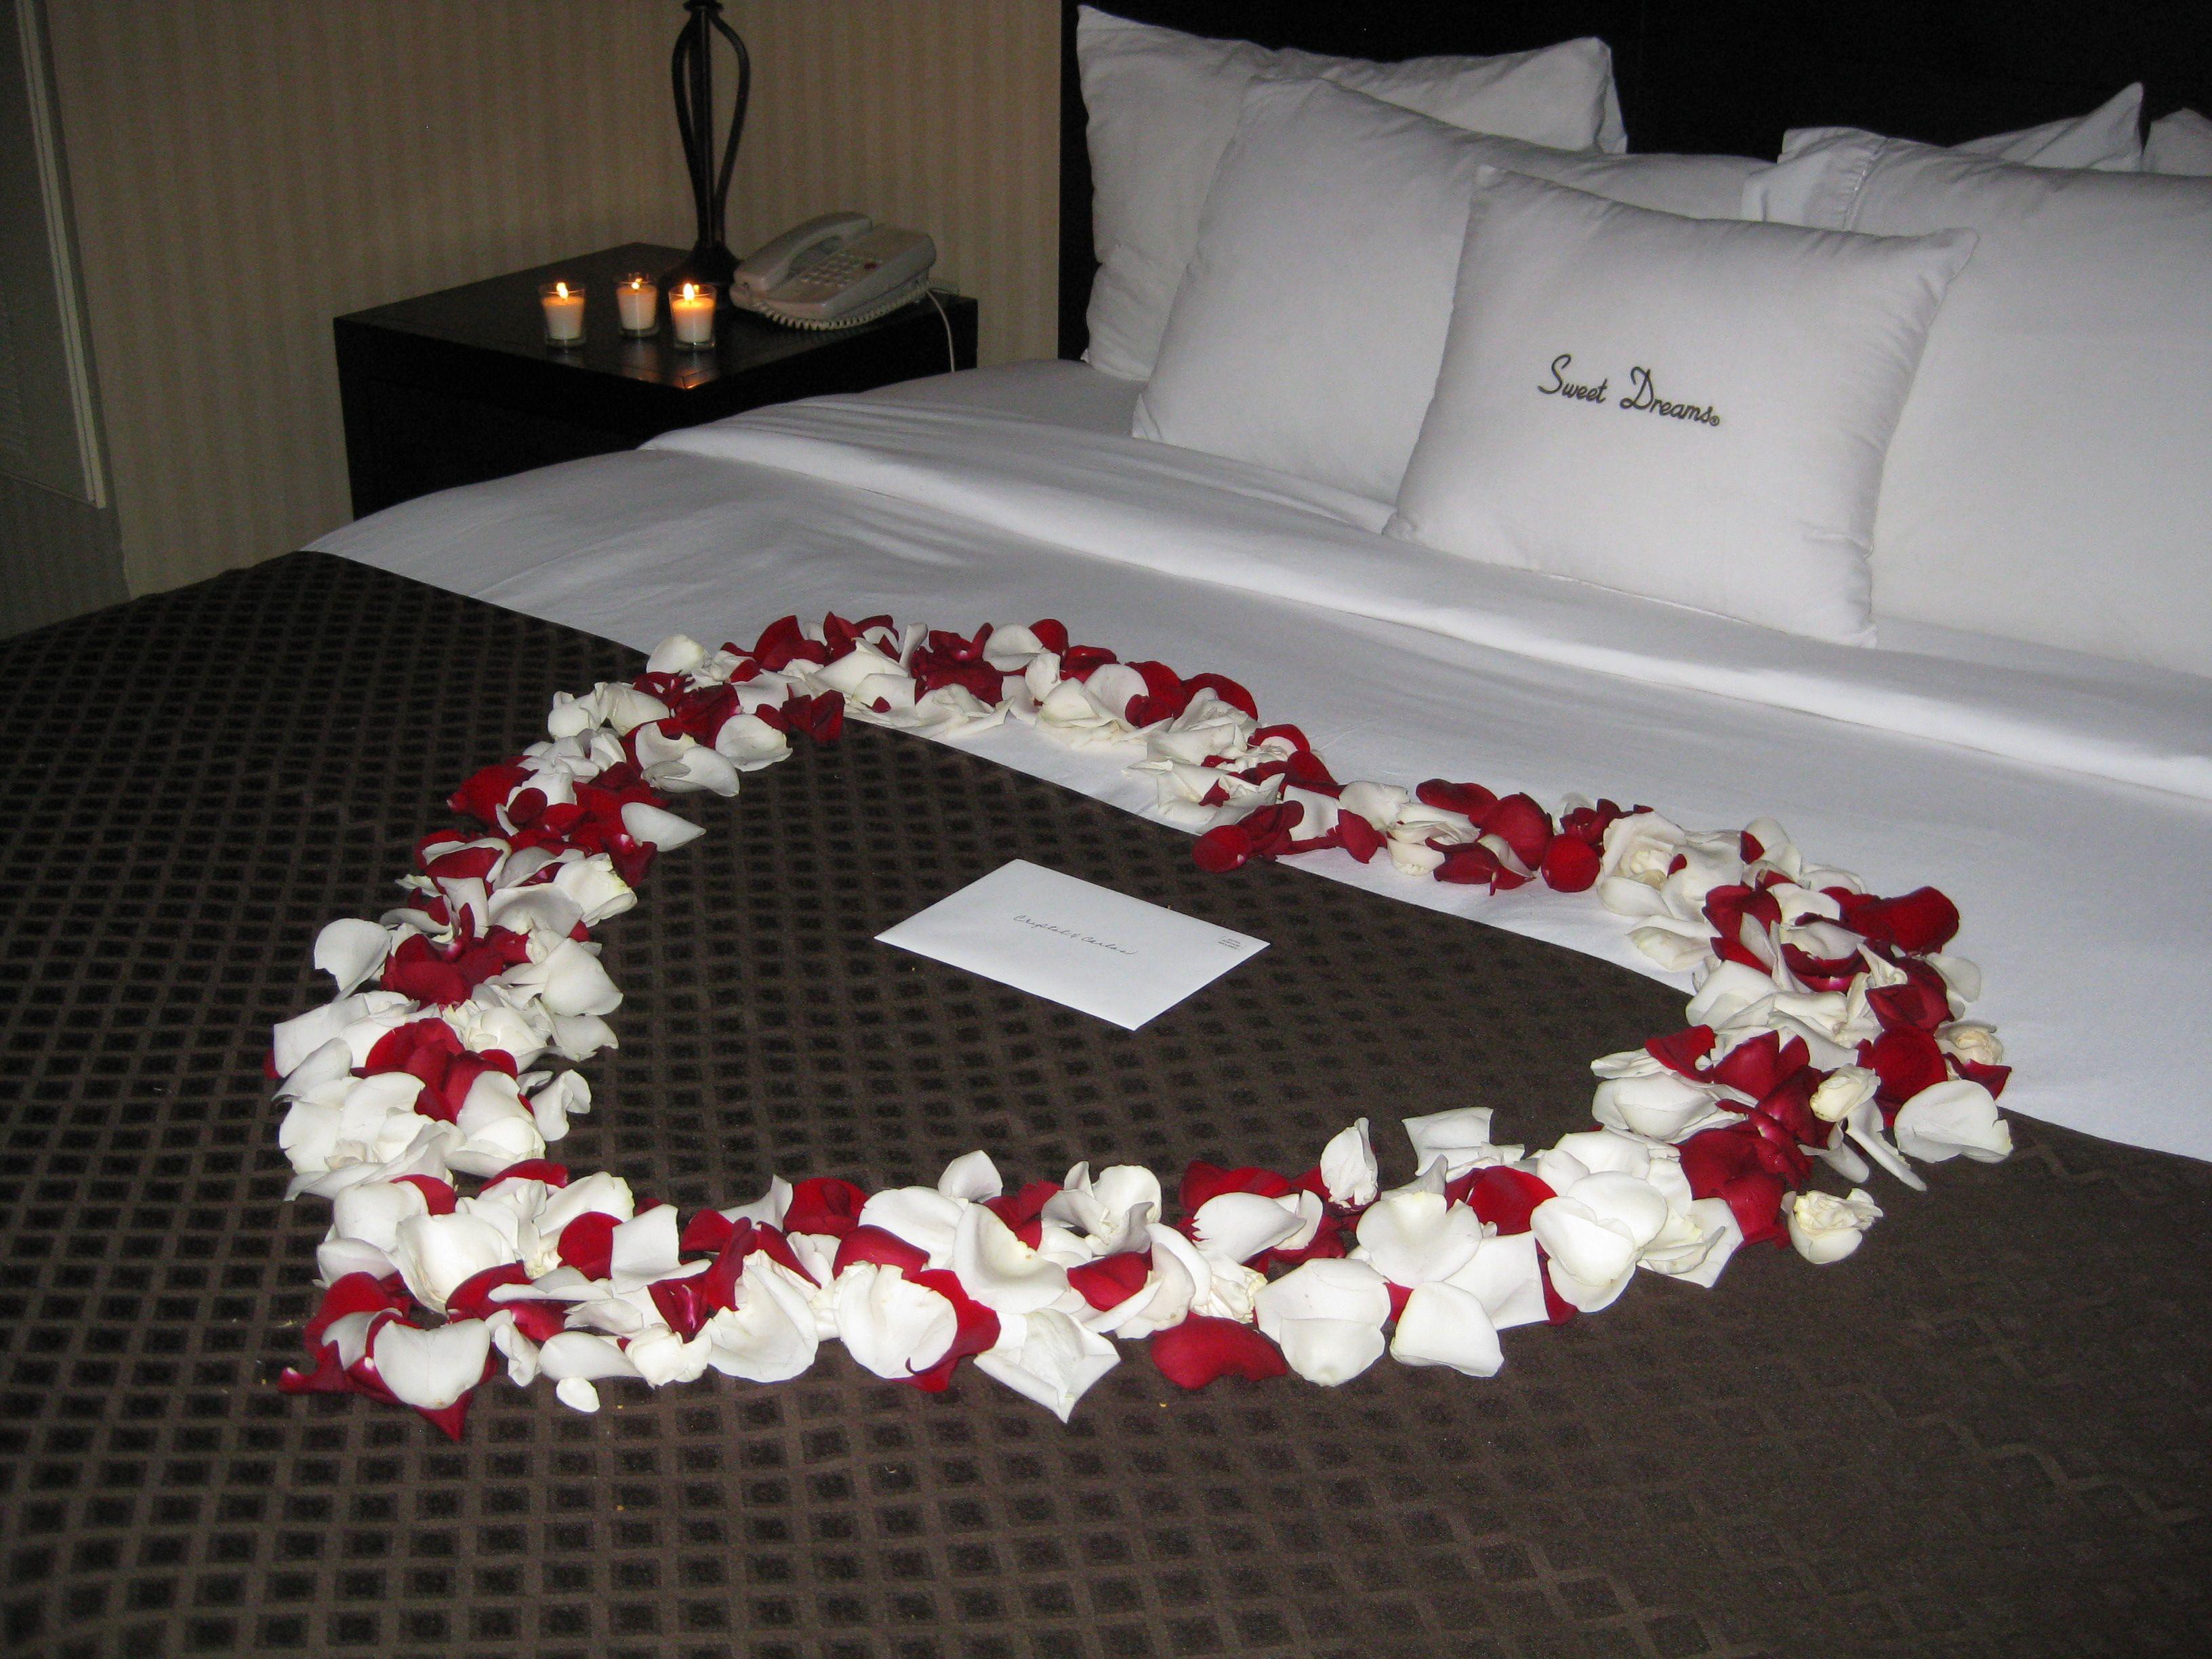 Affaire Of Heart' Honeymoon Suite Decor